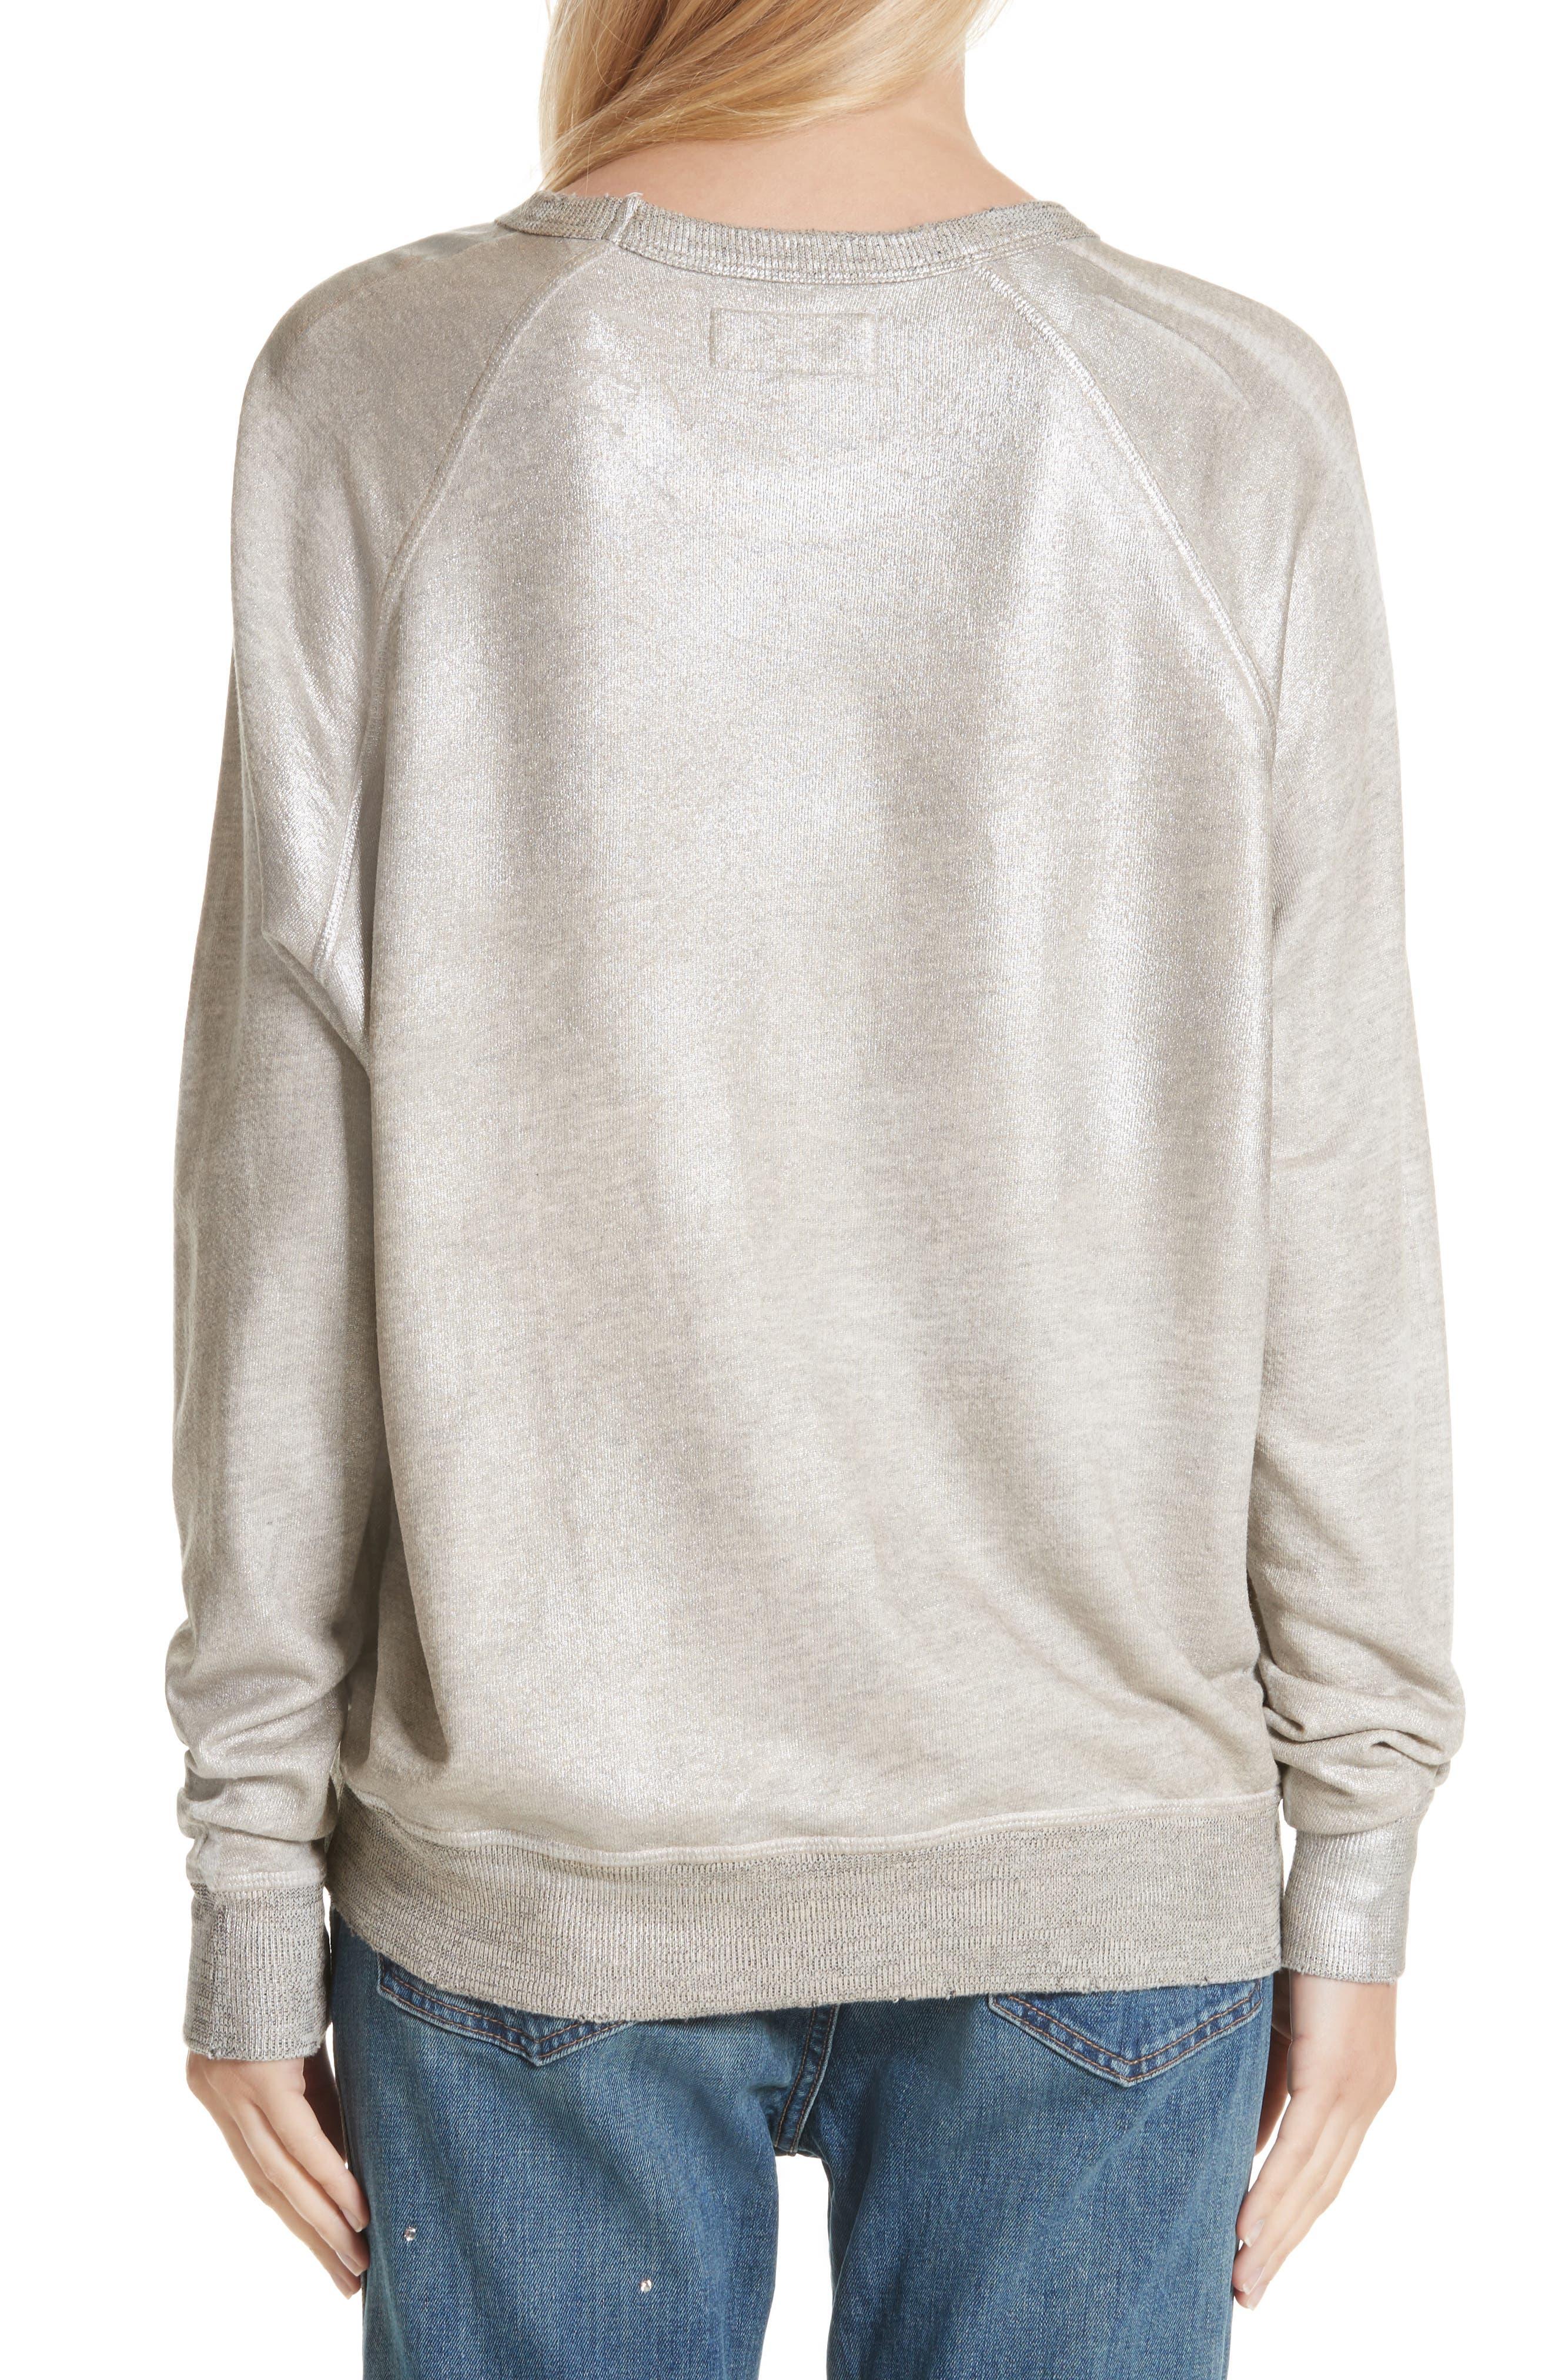 The College Metallic Foil Sweatshirt,                             Alternate thumbnail 3, color,                             Heather Grey